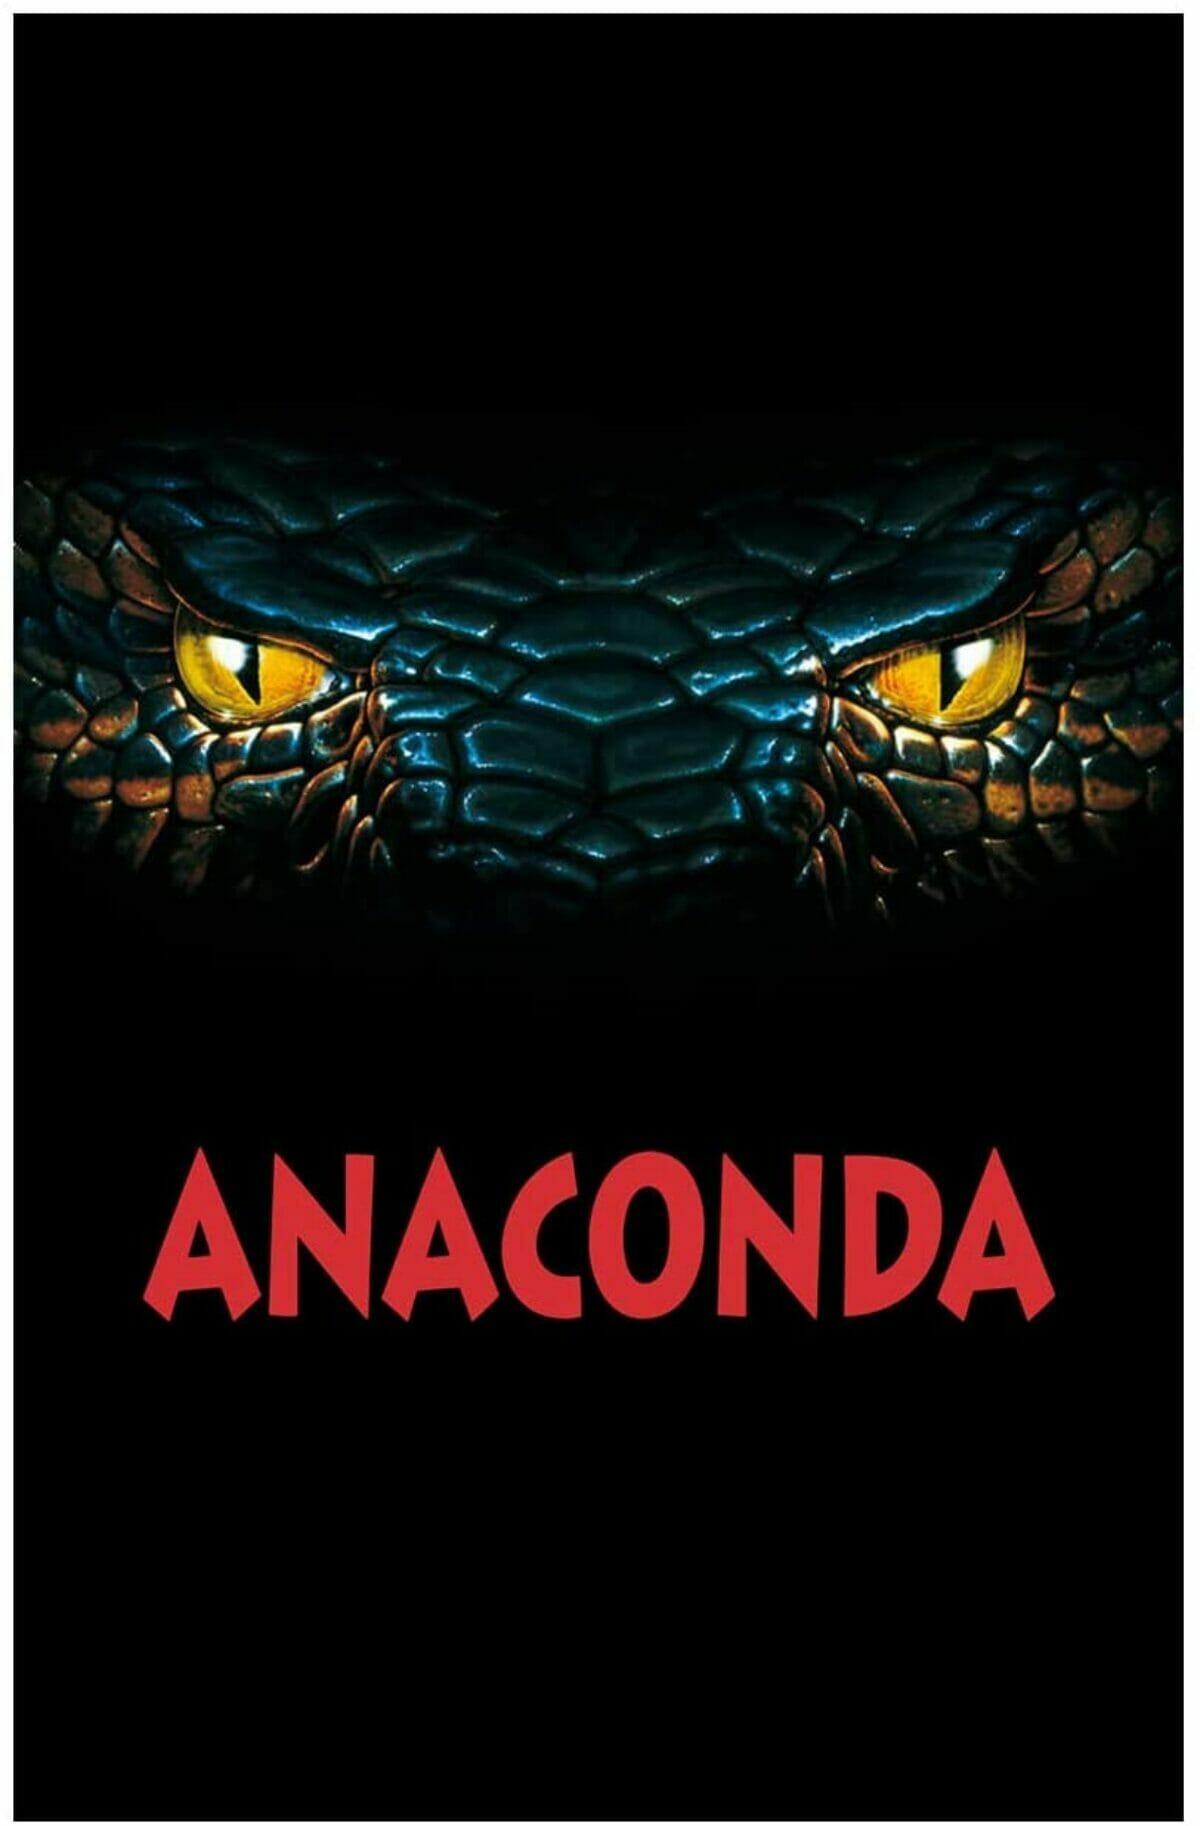 Anaconda-poster